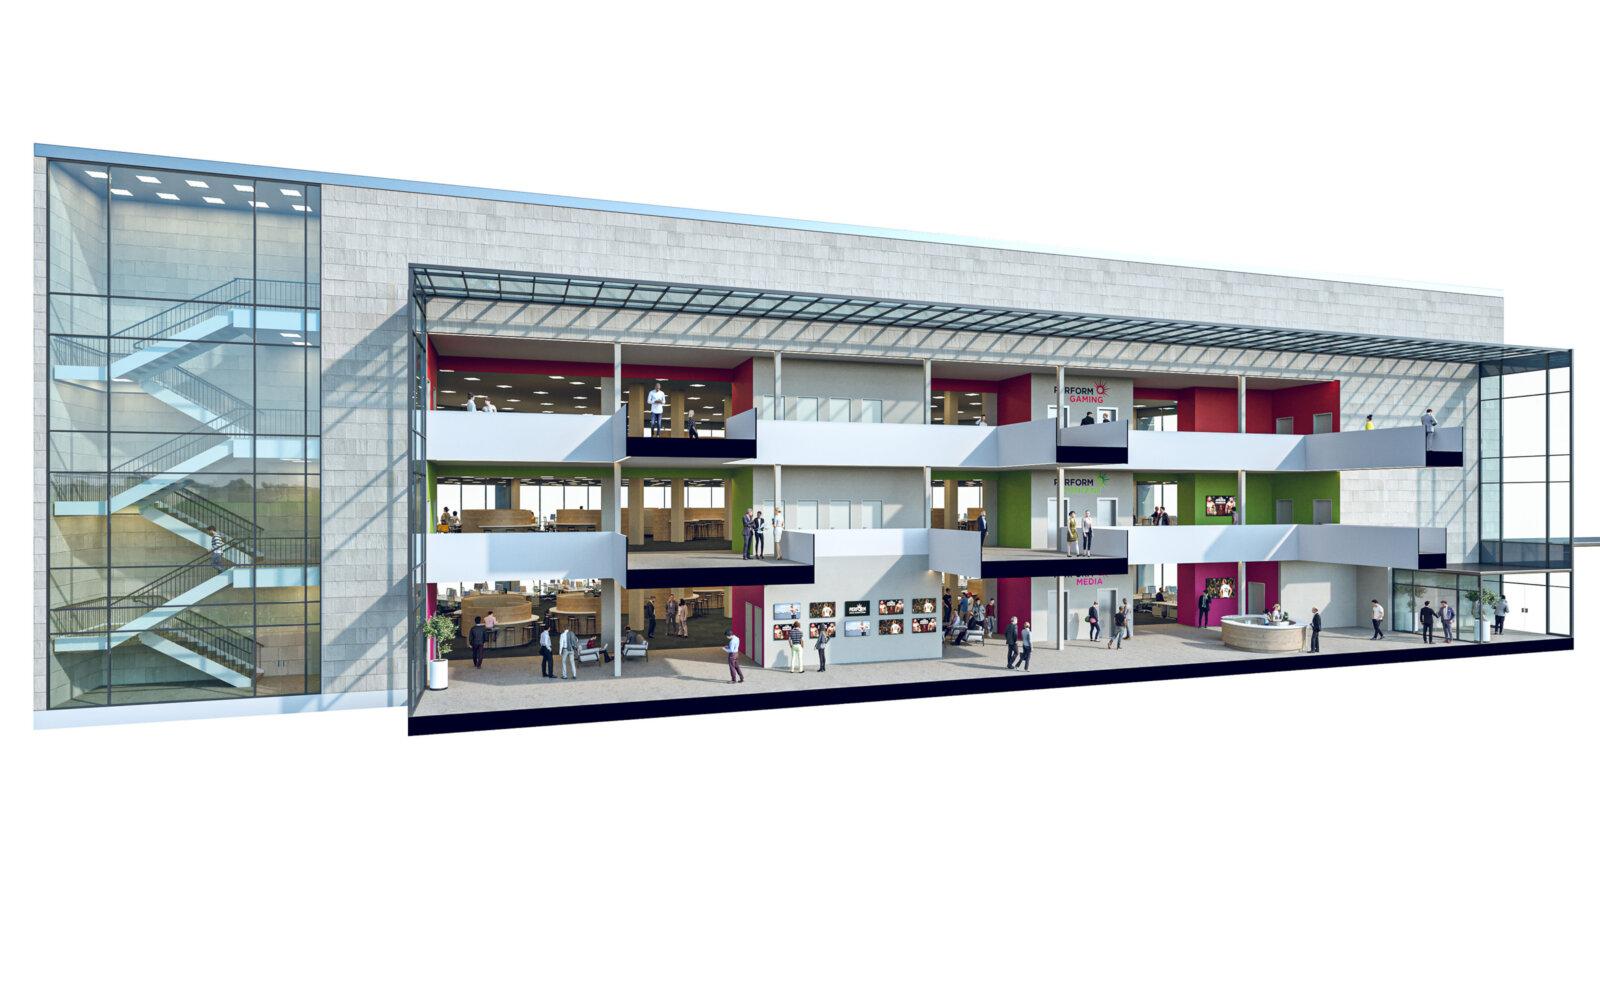 Office Building Extension Munroe K Ltd White Rose Office Park section diagram